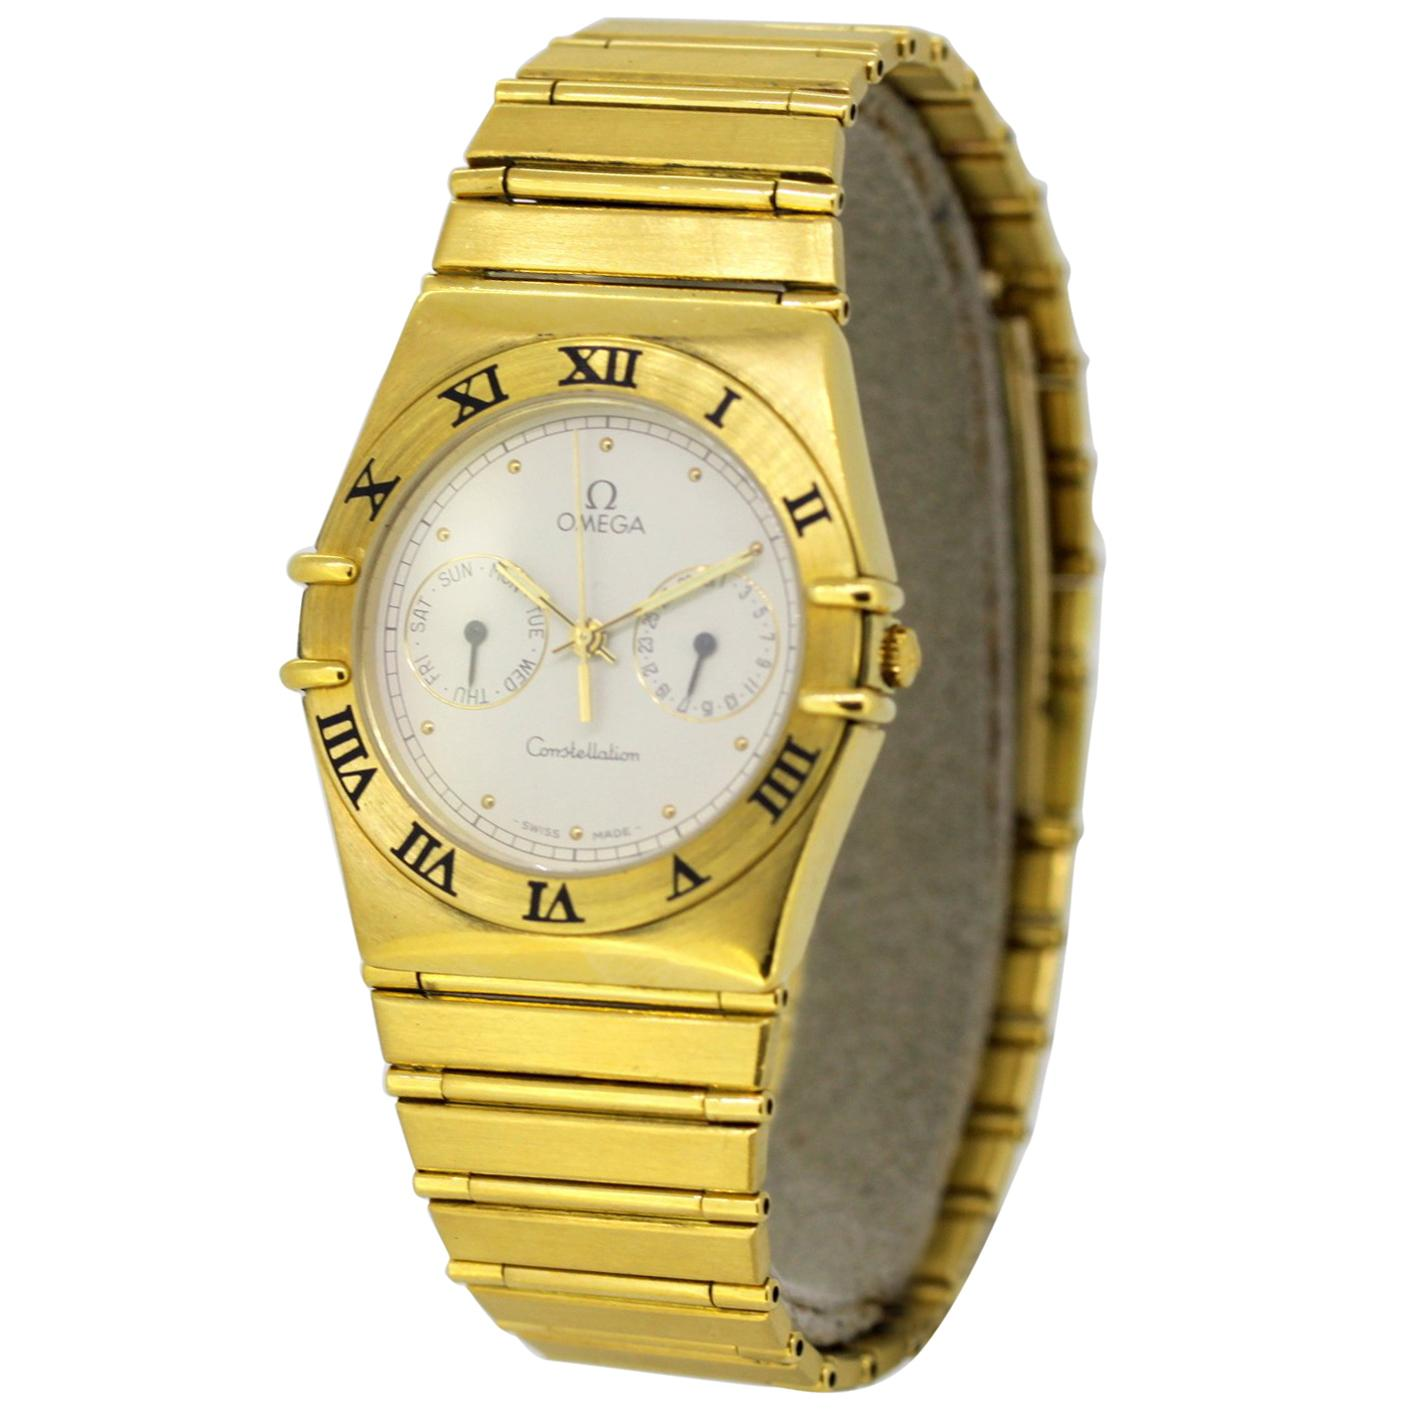 Vintage Omega Constellation Quartz Wristwatch Set in Full 18 Karat Gold